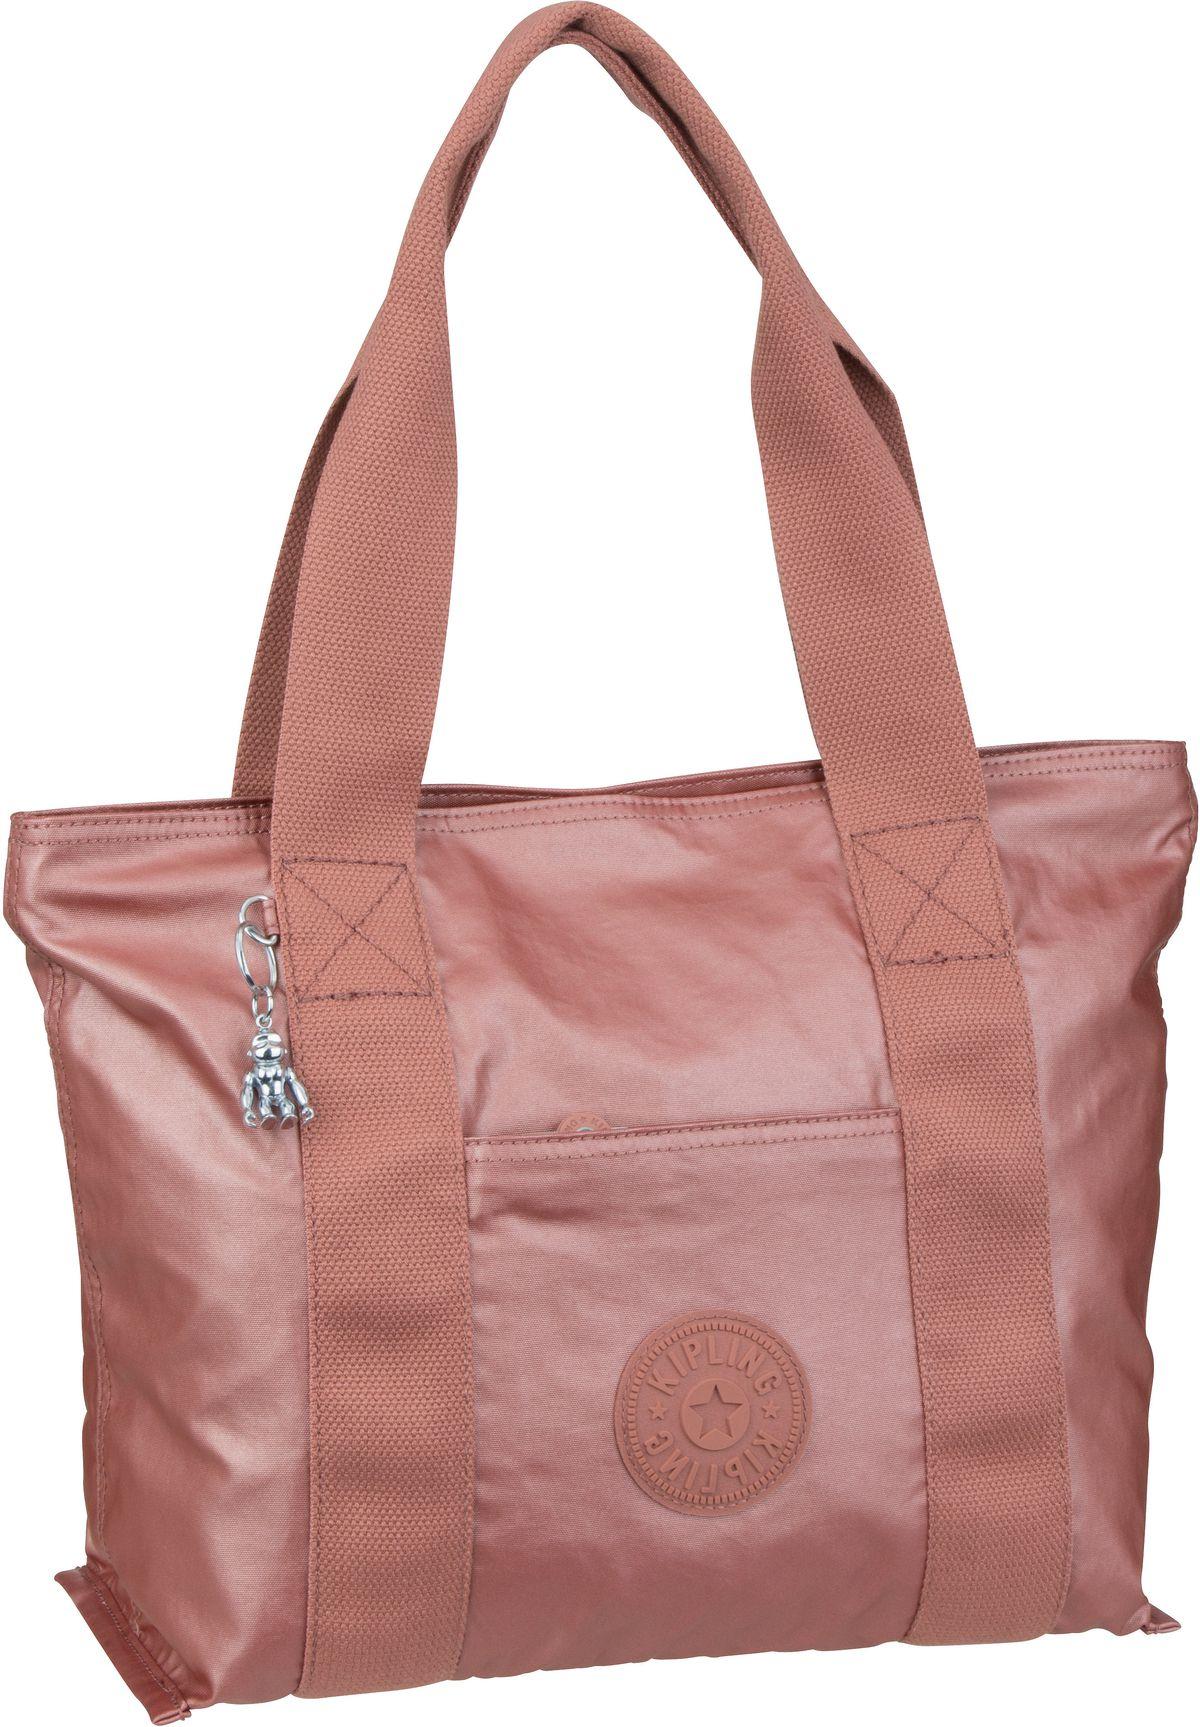 Handtasche Era S Edgeland Metallic Rust (15 Liter)